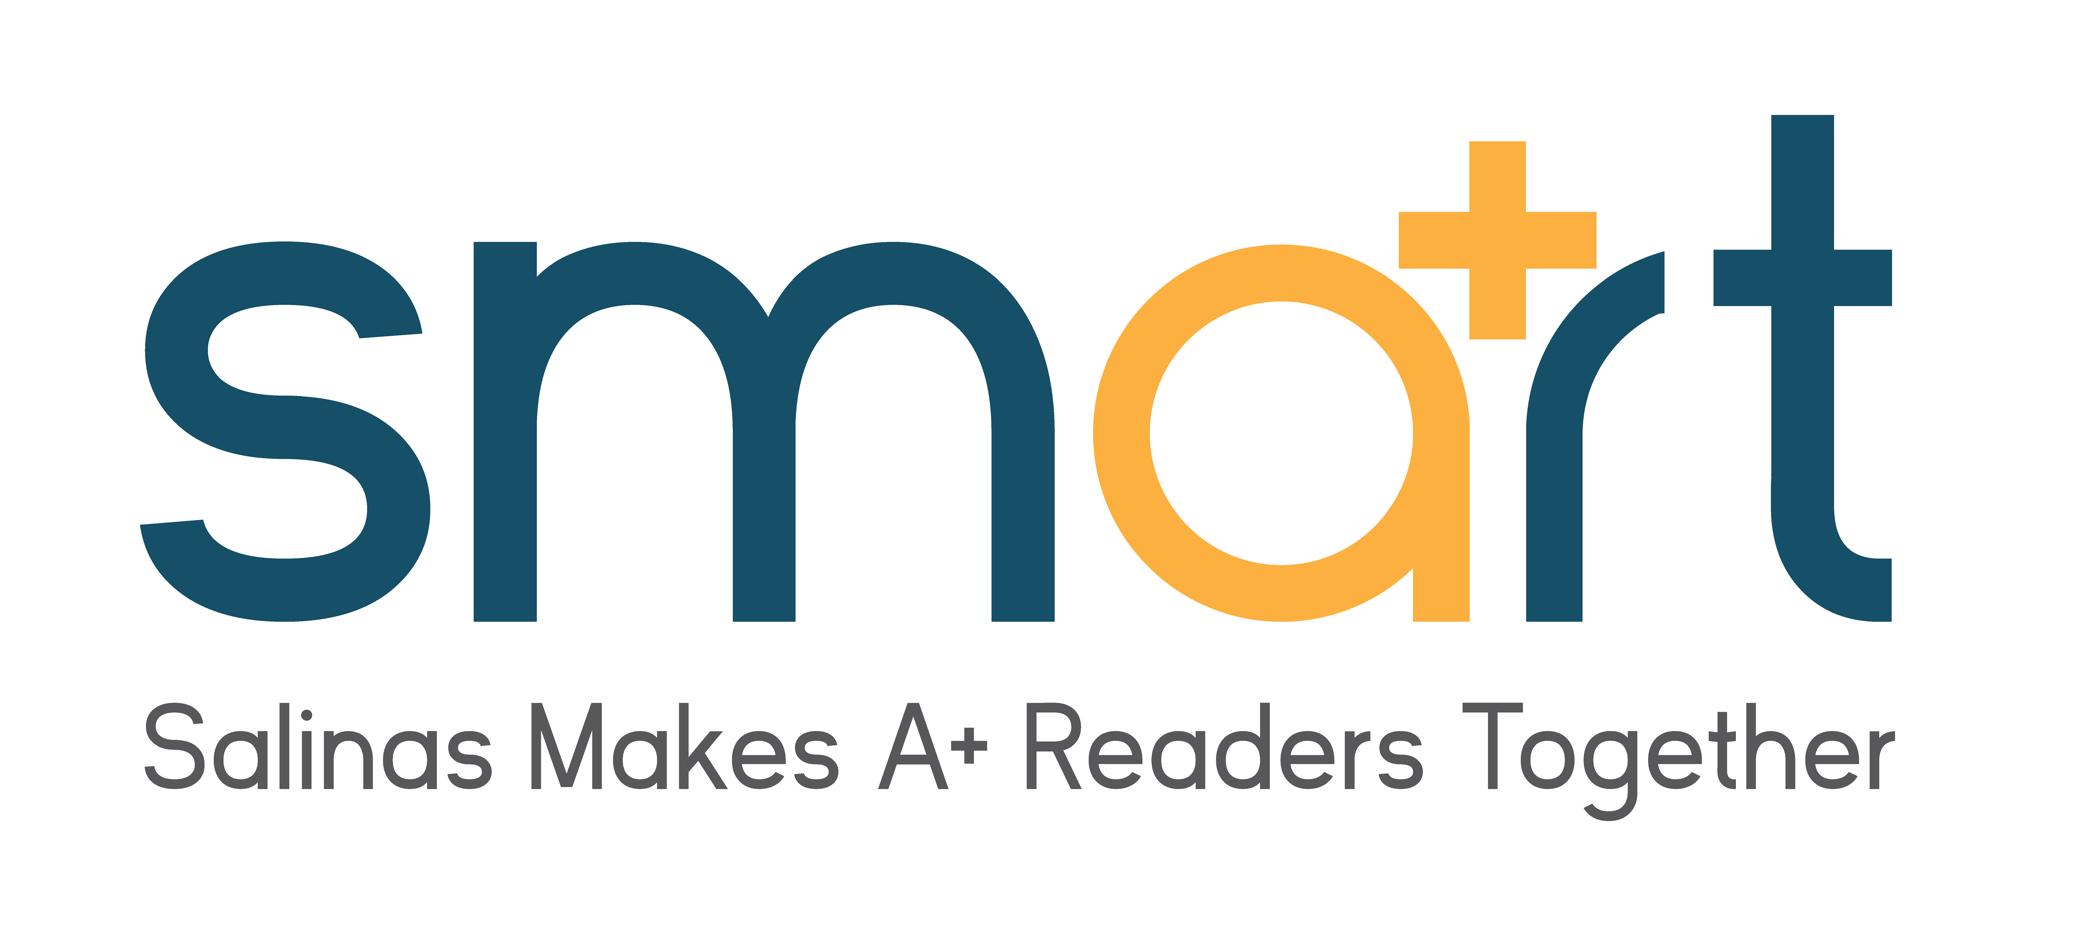 Smart Card logo - Salinas Makes A+ Readers Together